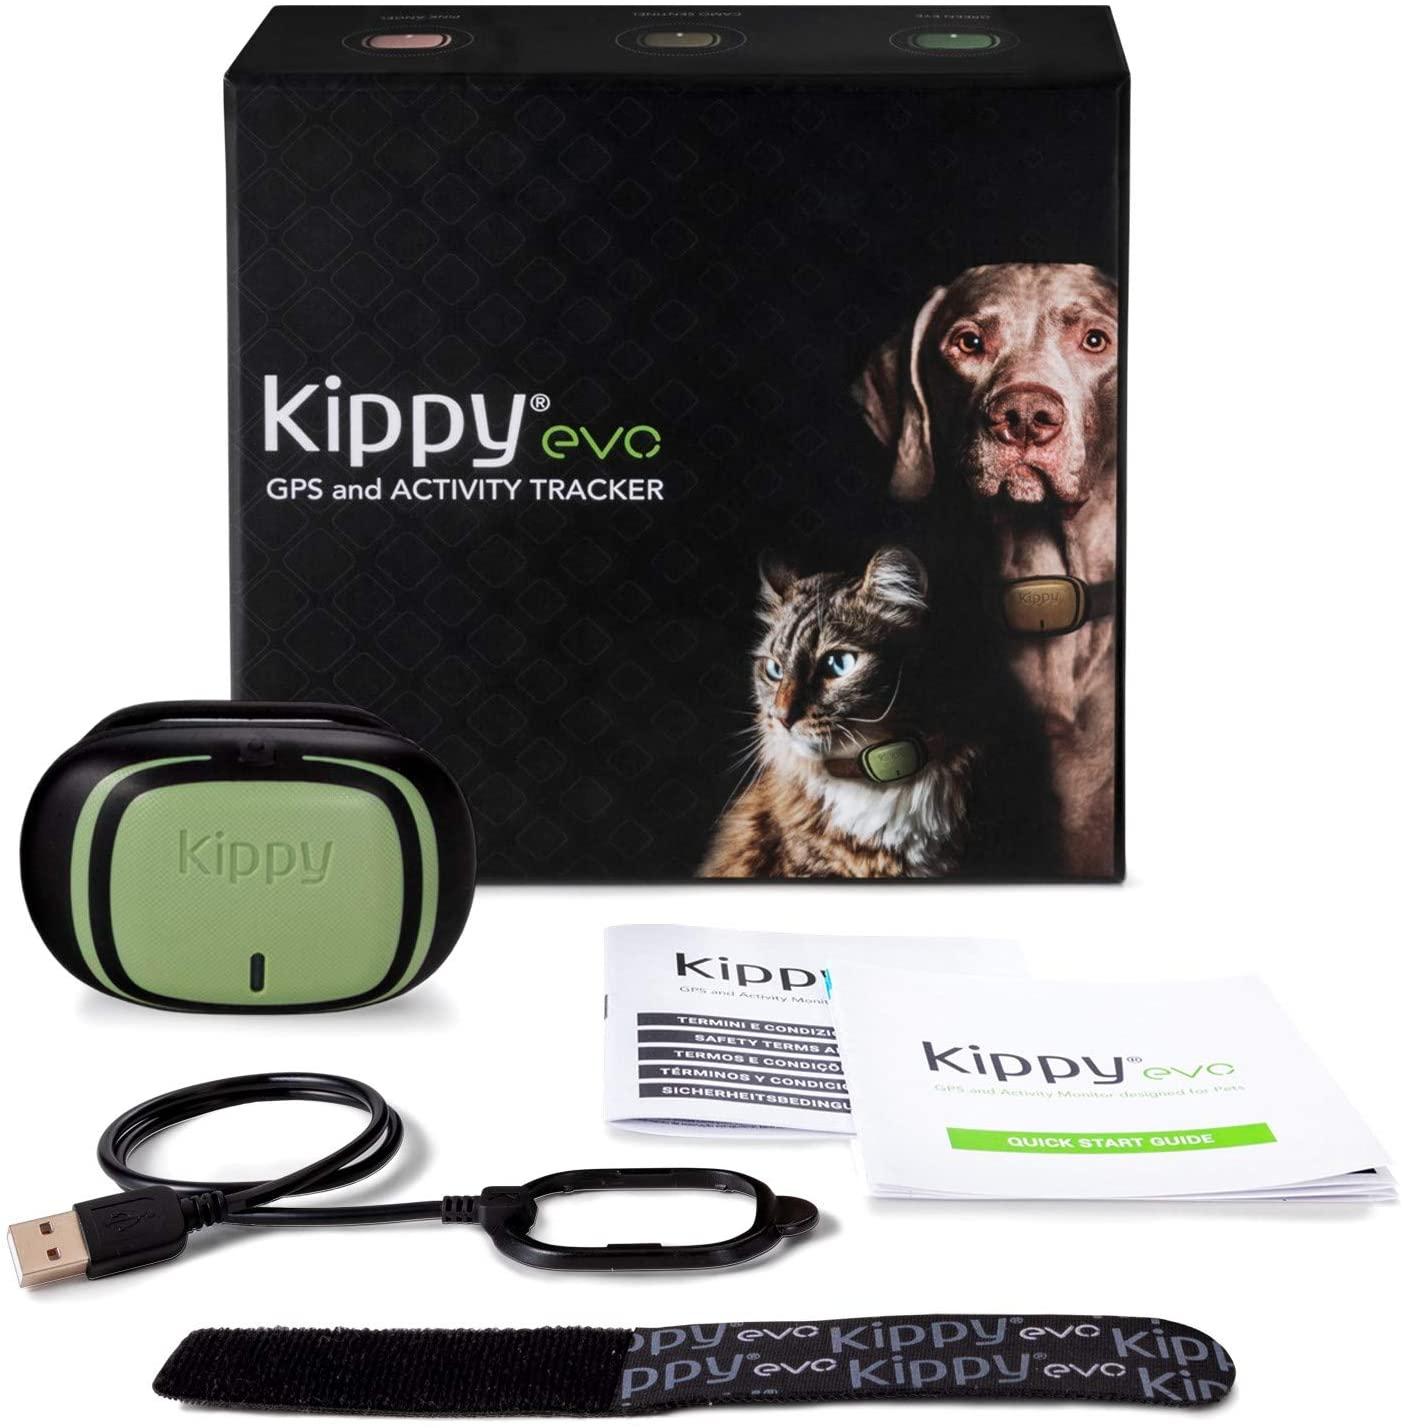 KIPPY EVO The new GPS Tracker